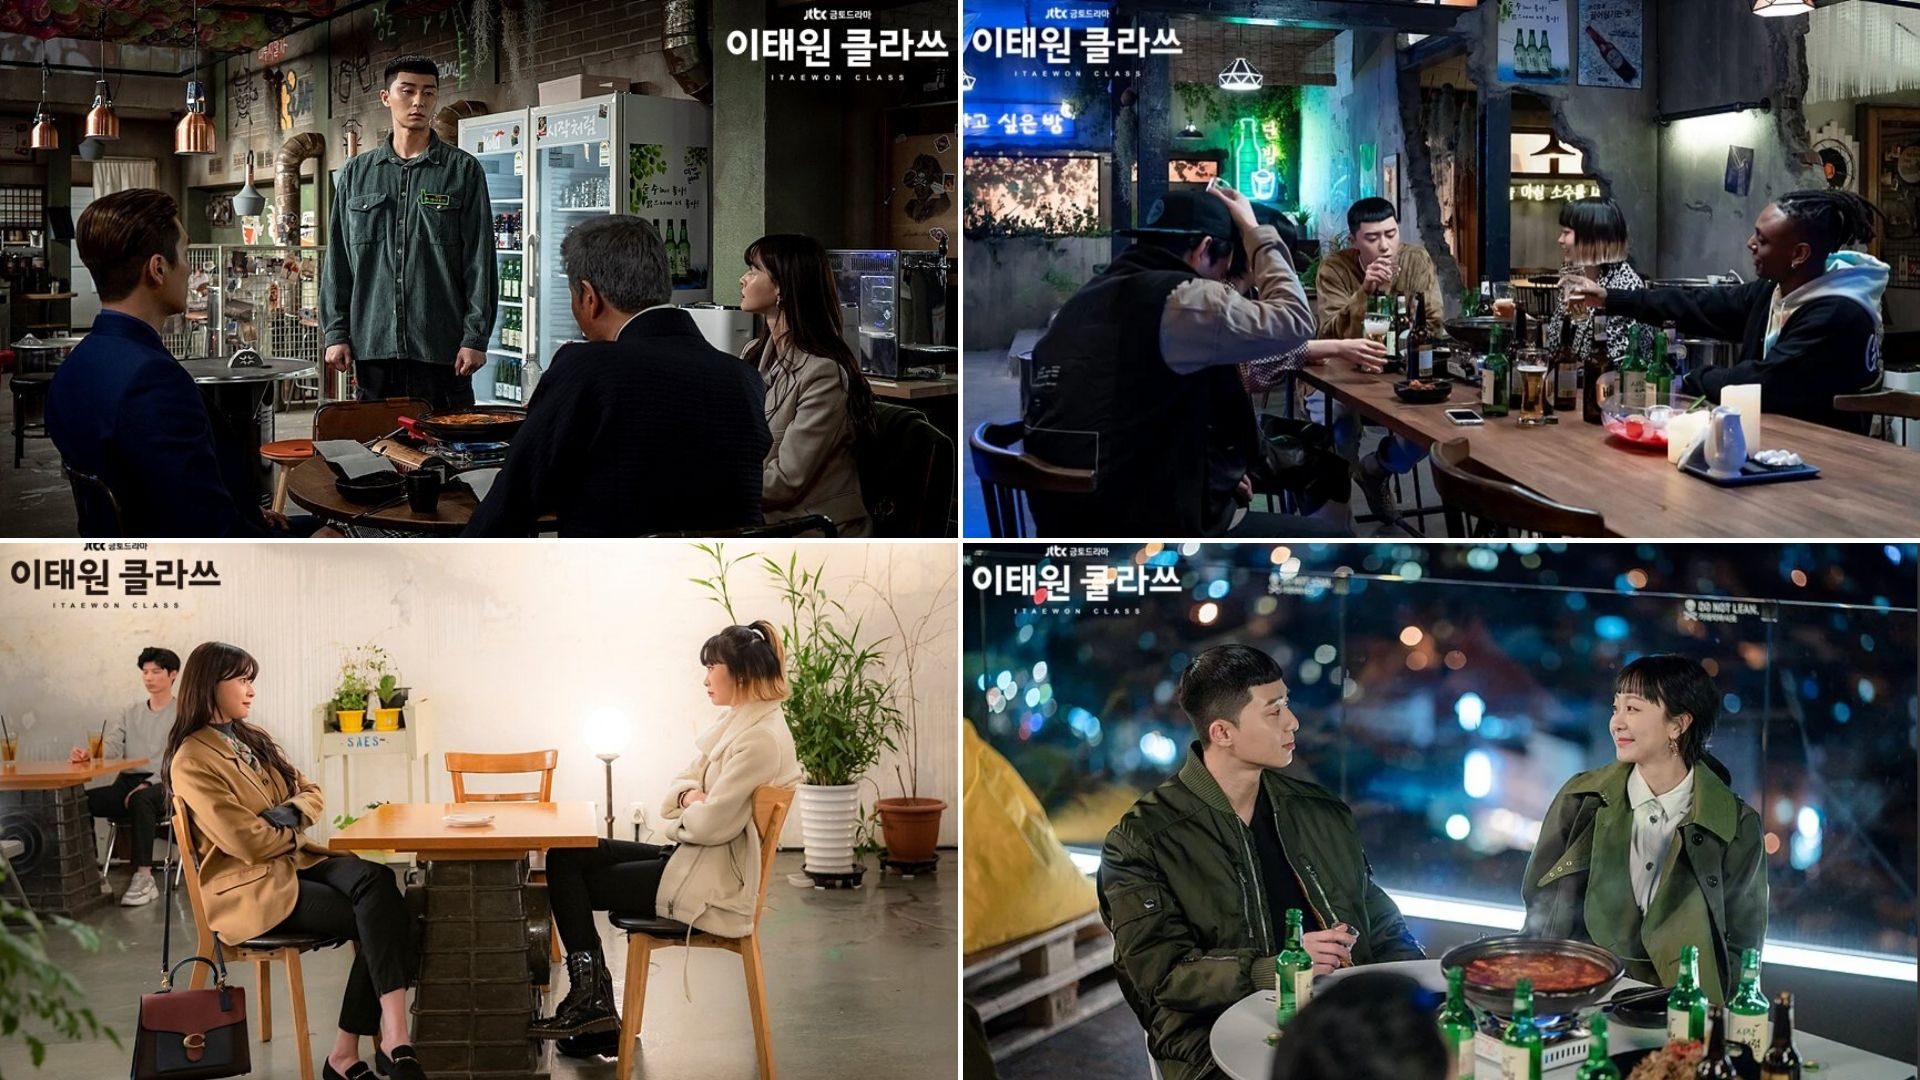 itaewon restaurants